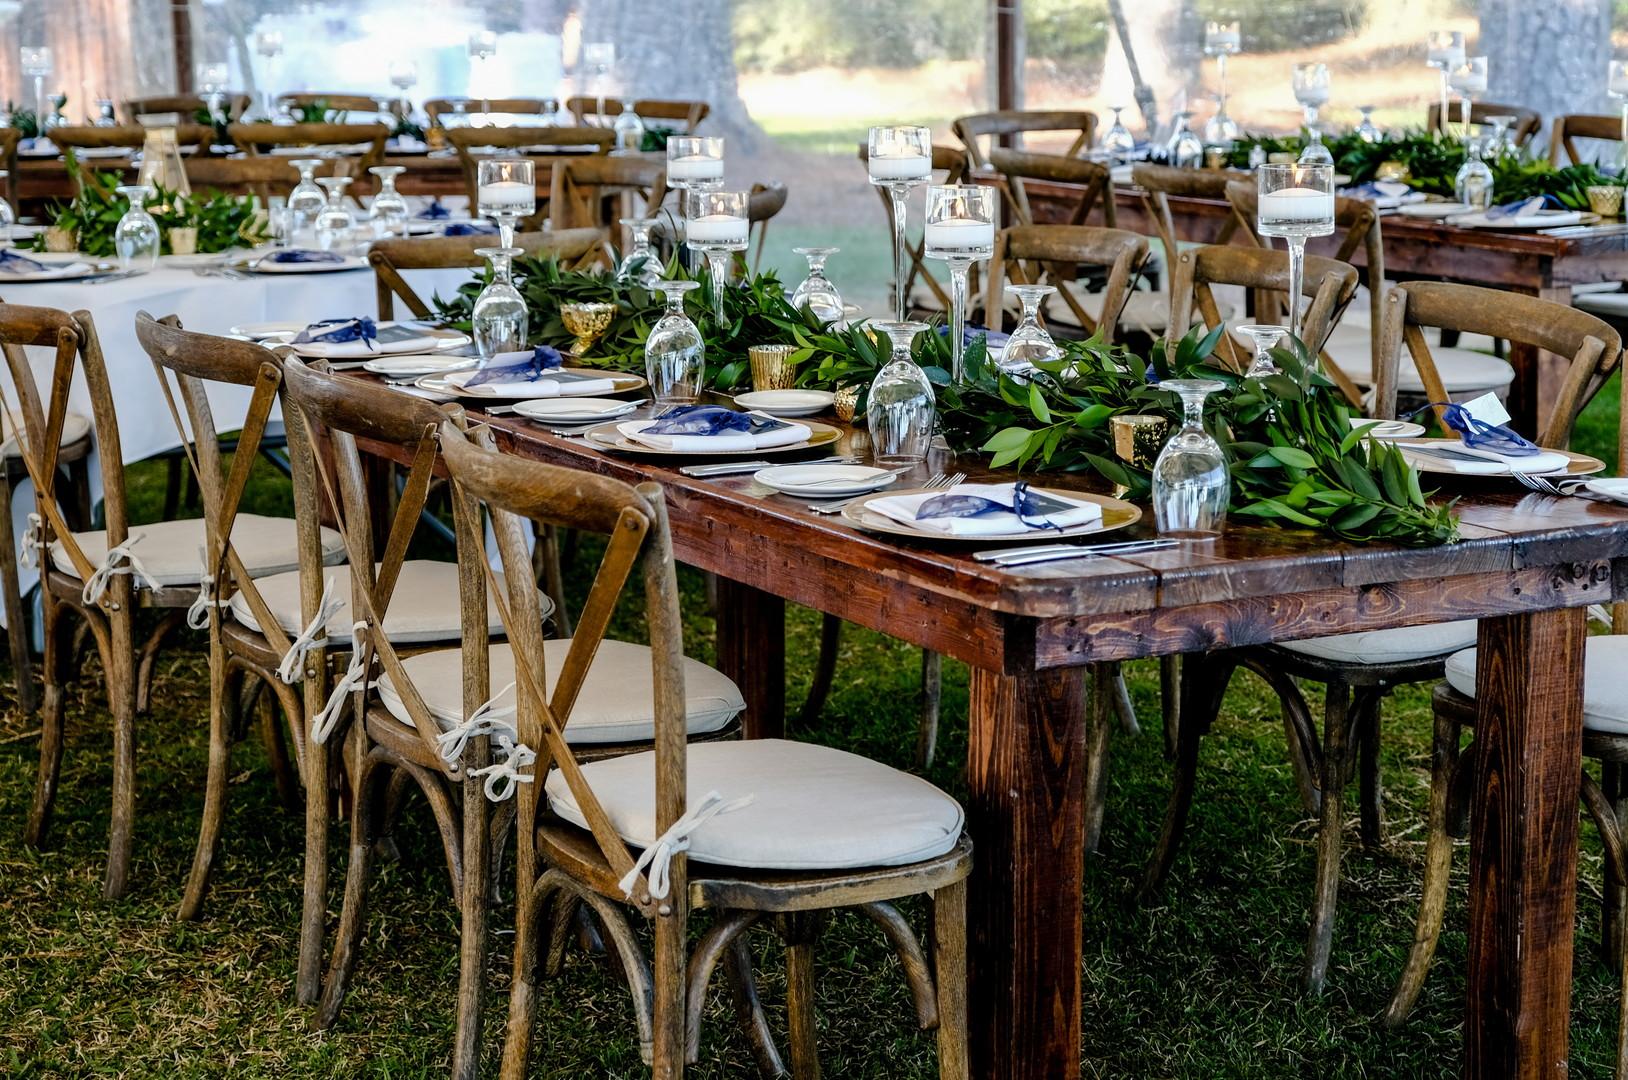 oldfield-club-wedding-11.jpg